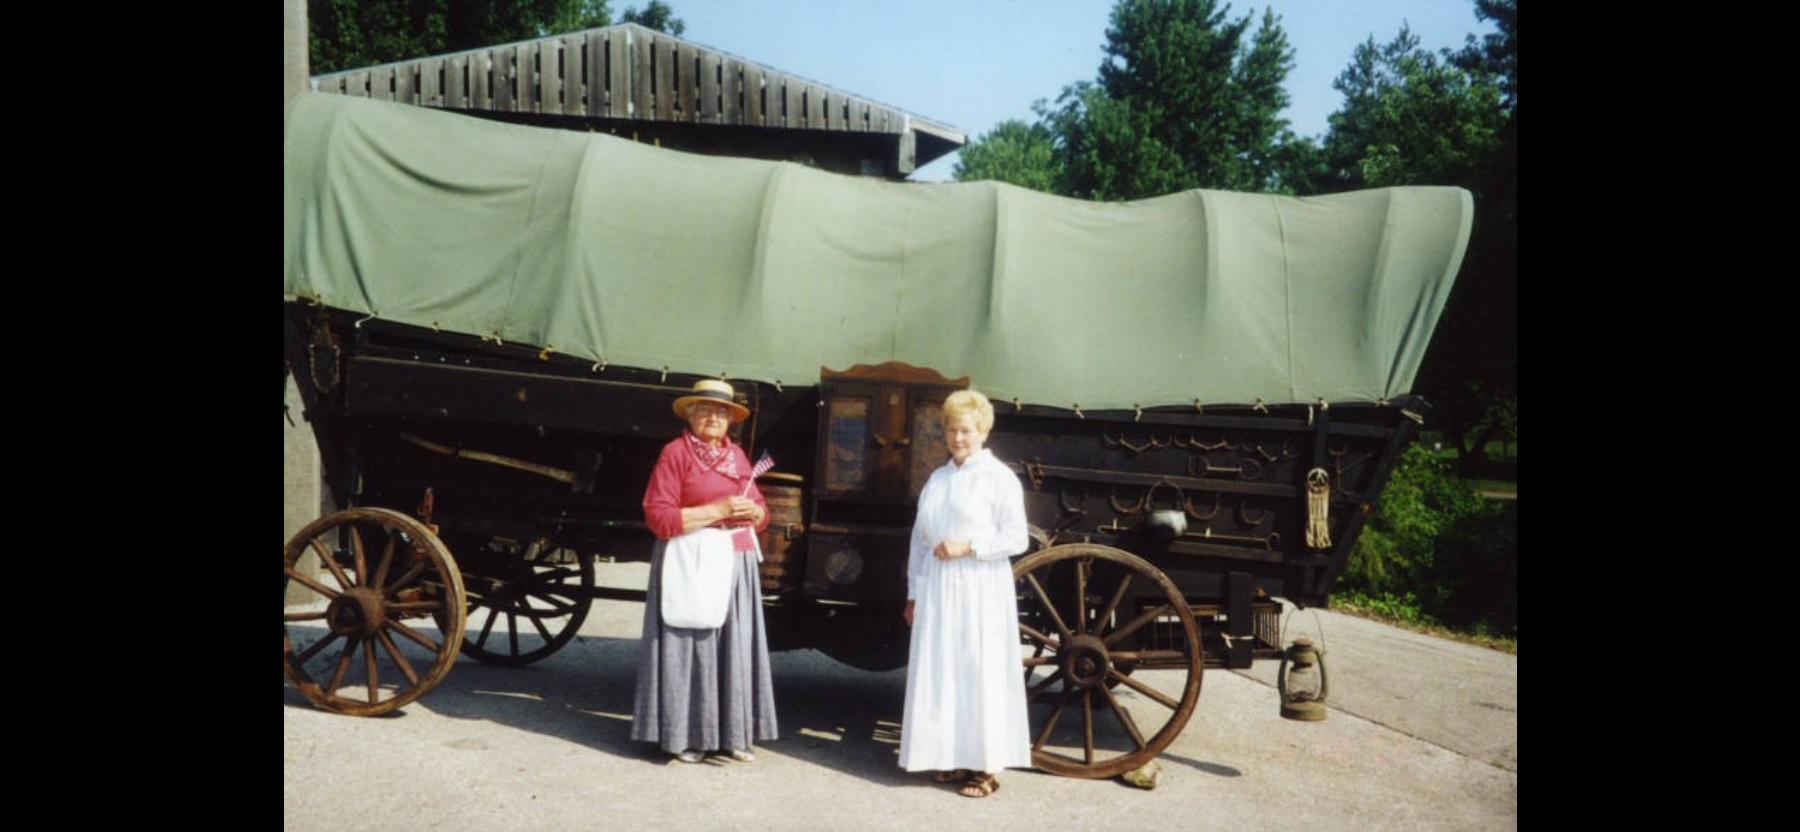 The historical society's Conestoga prairie schooner wagon